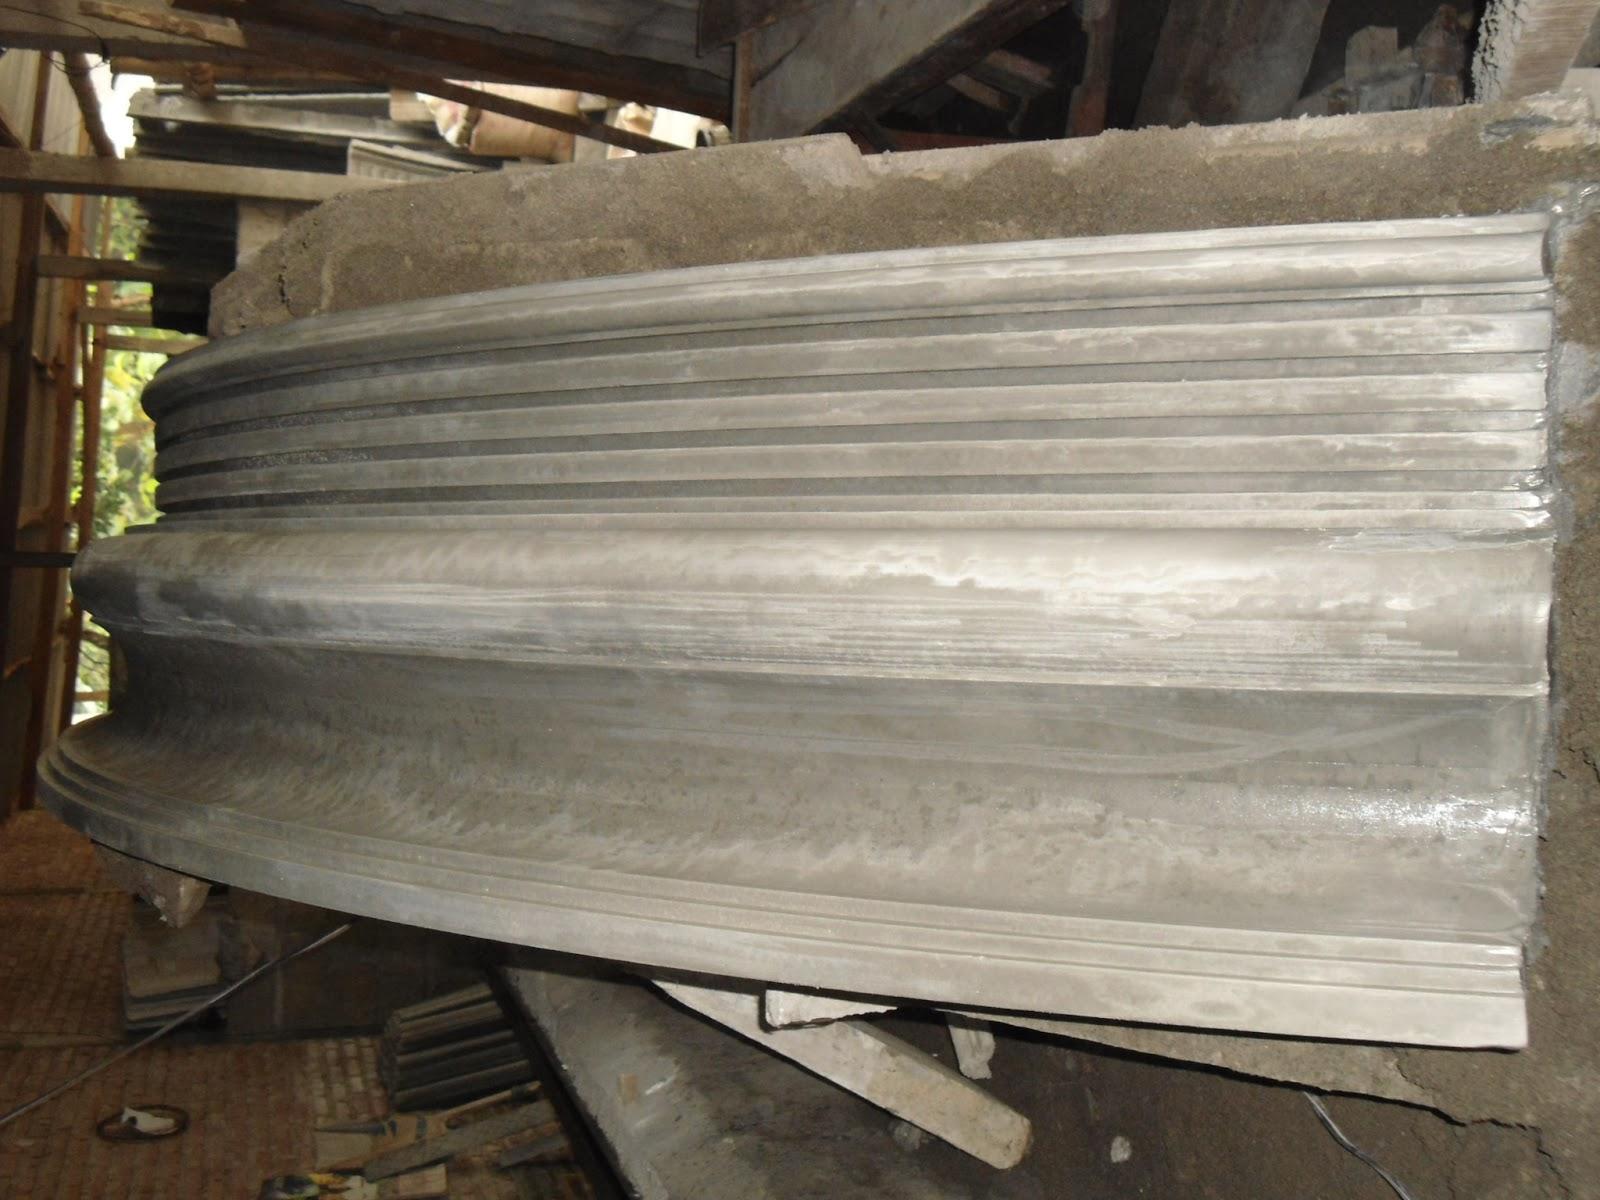 sanjaya profil beton lingkar listplank biola serutan. Black Bedroom Furniture Sets. Home Design Ideas